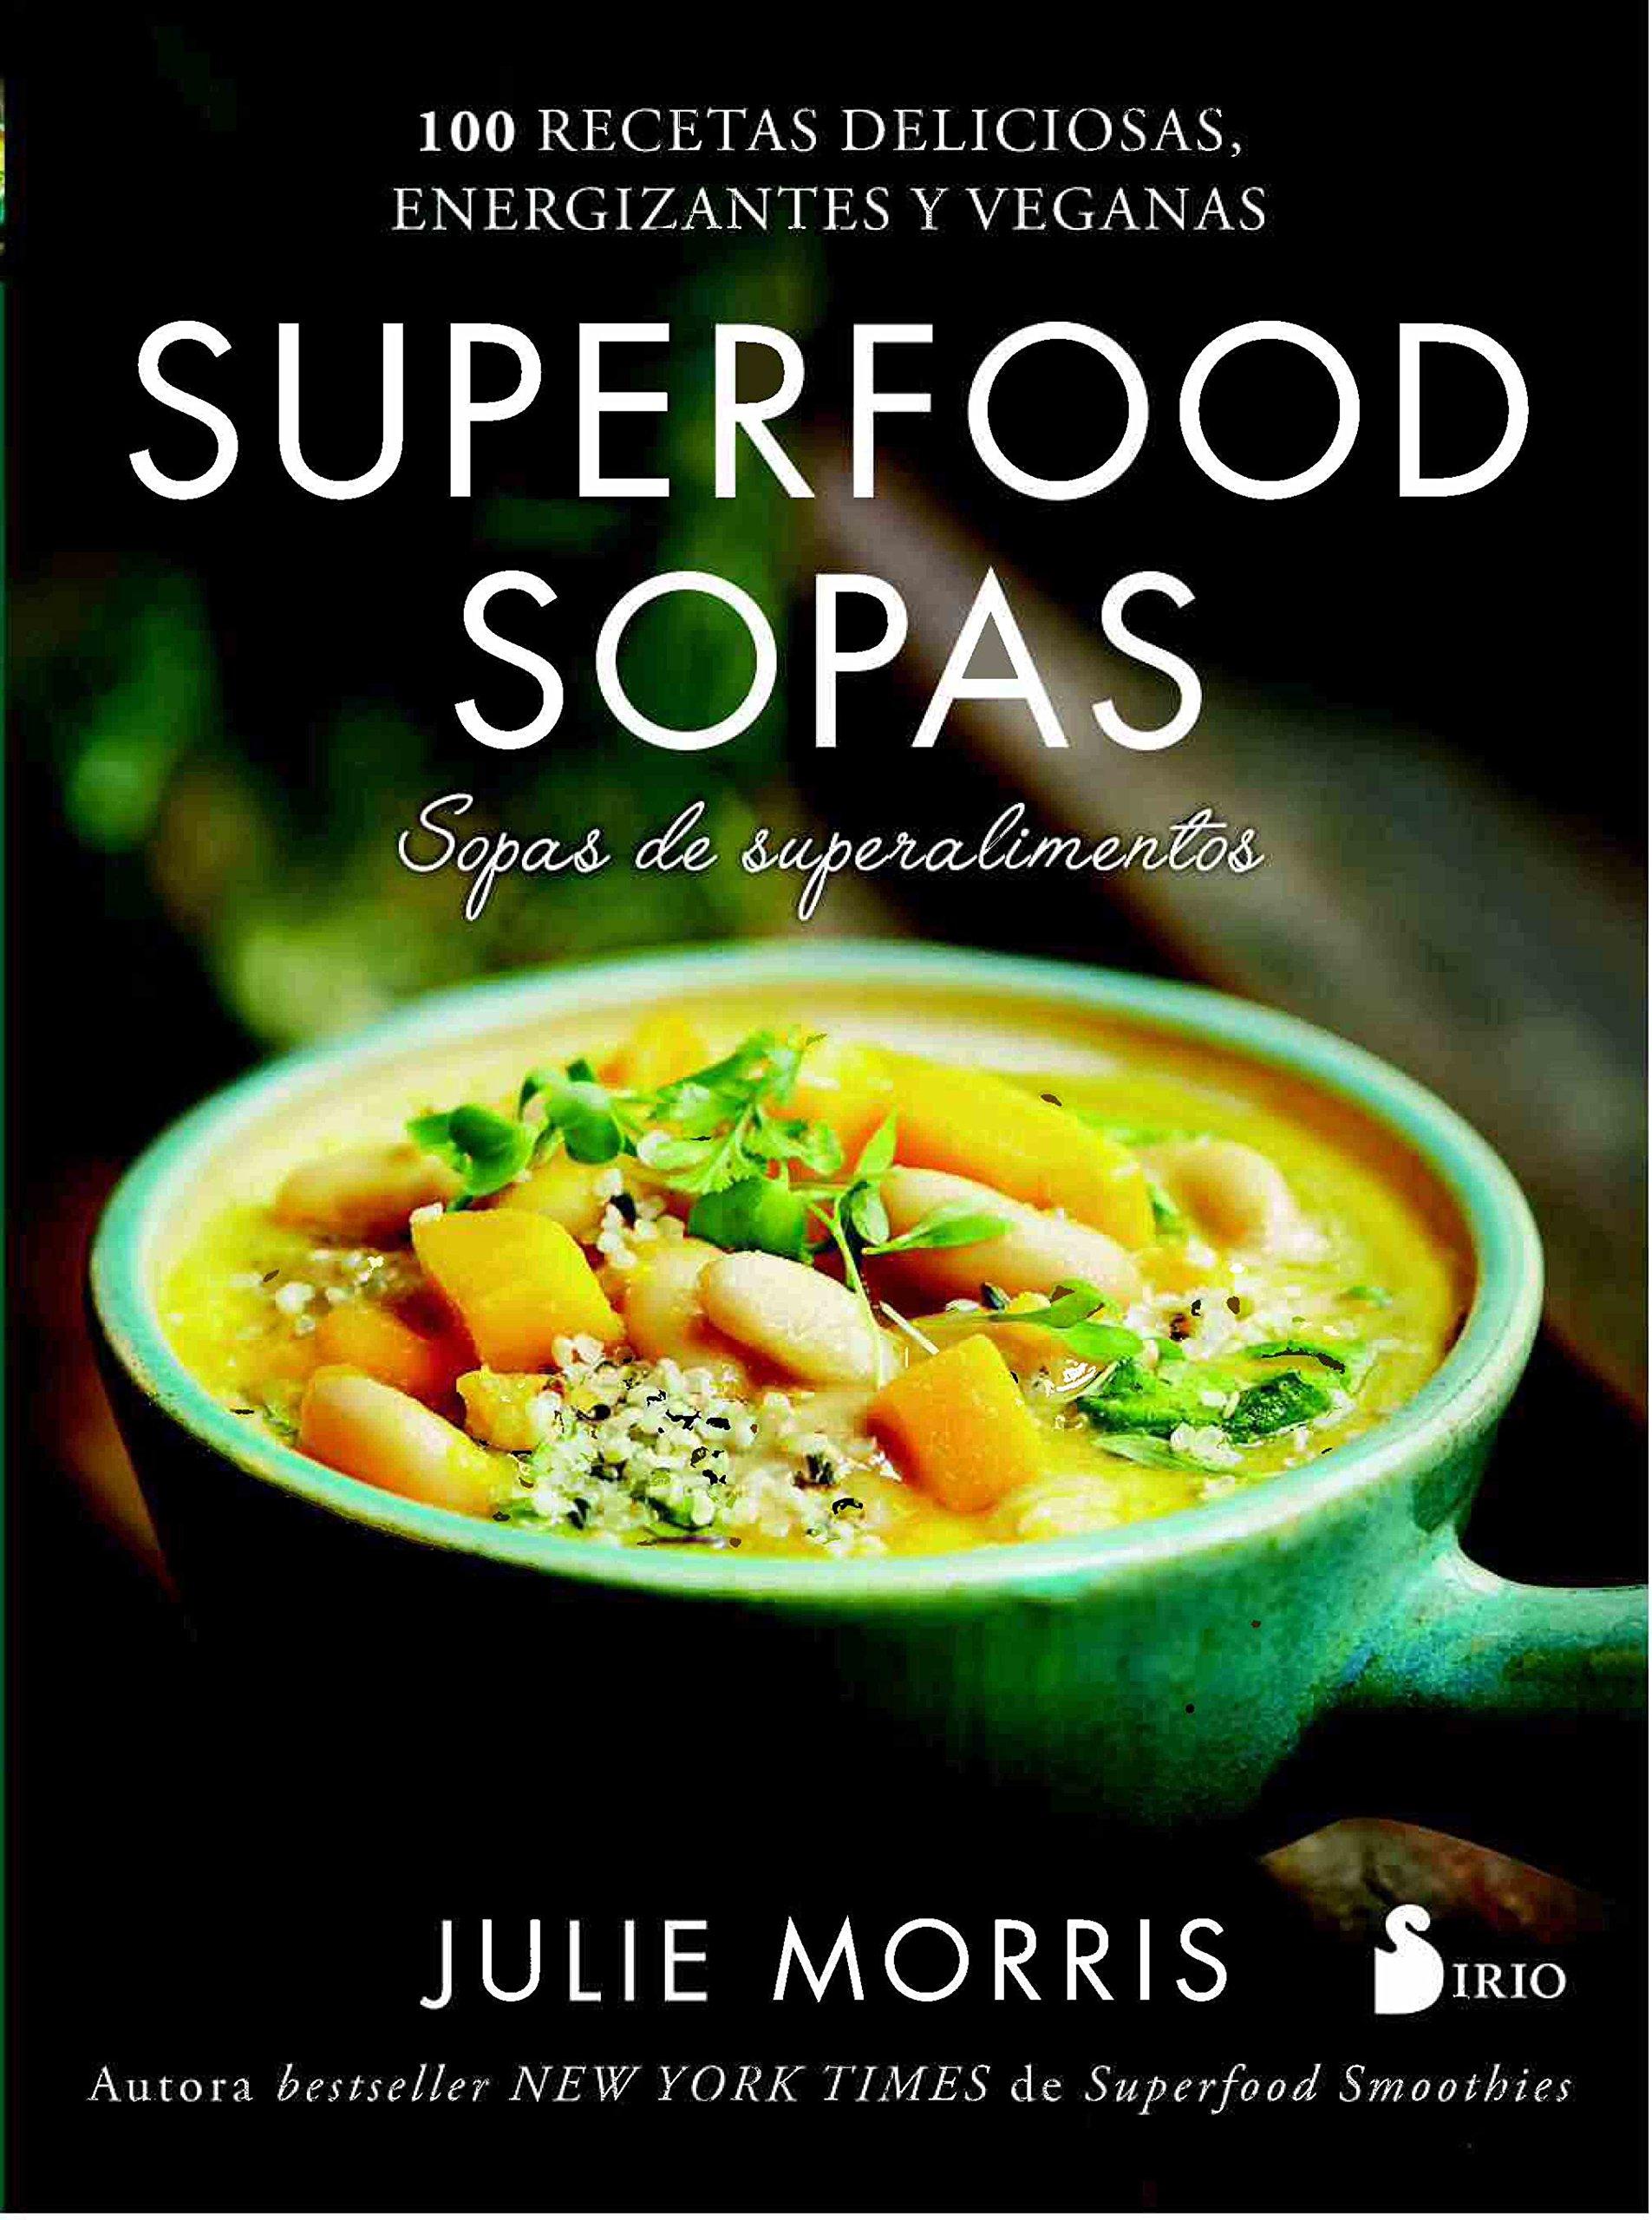 Superfood sopas (Spanish Edition): Julie Morris: 9788417030421: Amazon.com:  Books